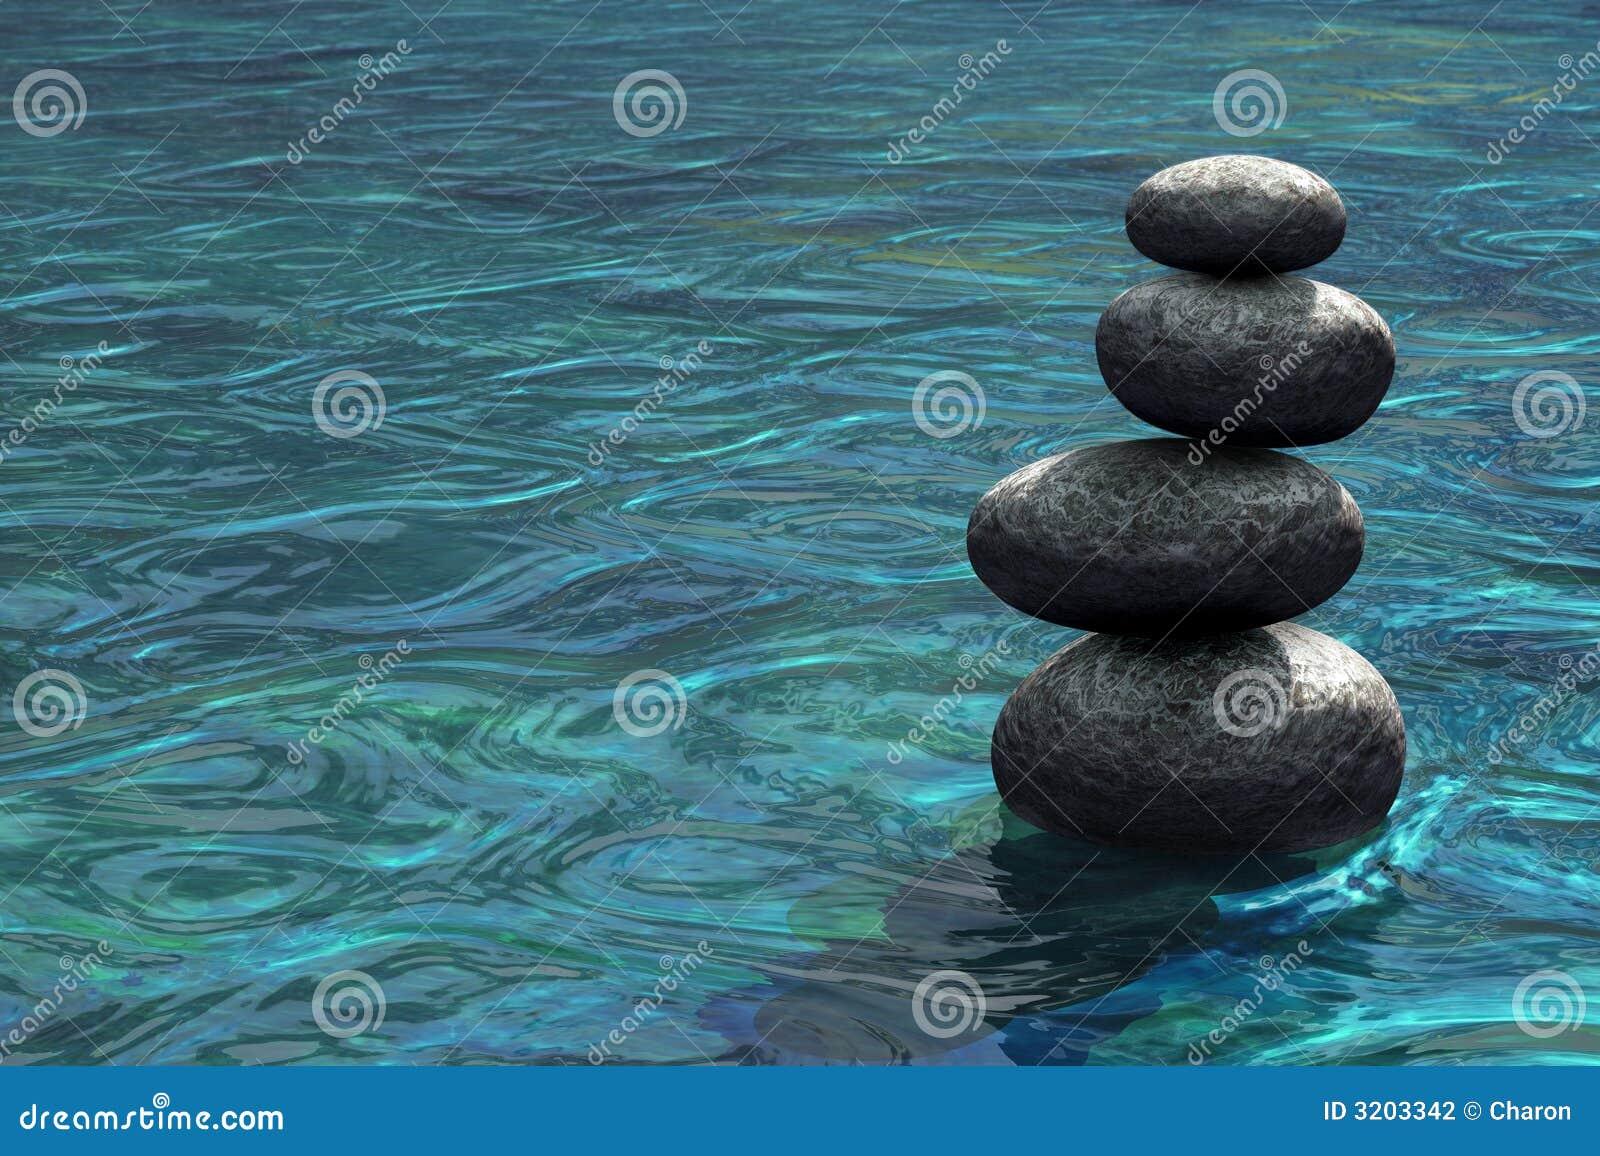 Zen stones stacked on river scene